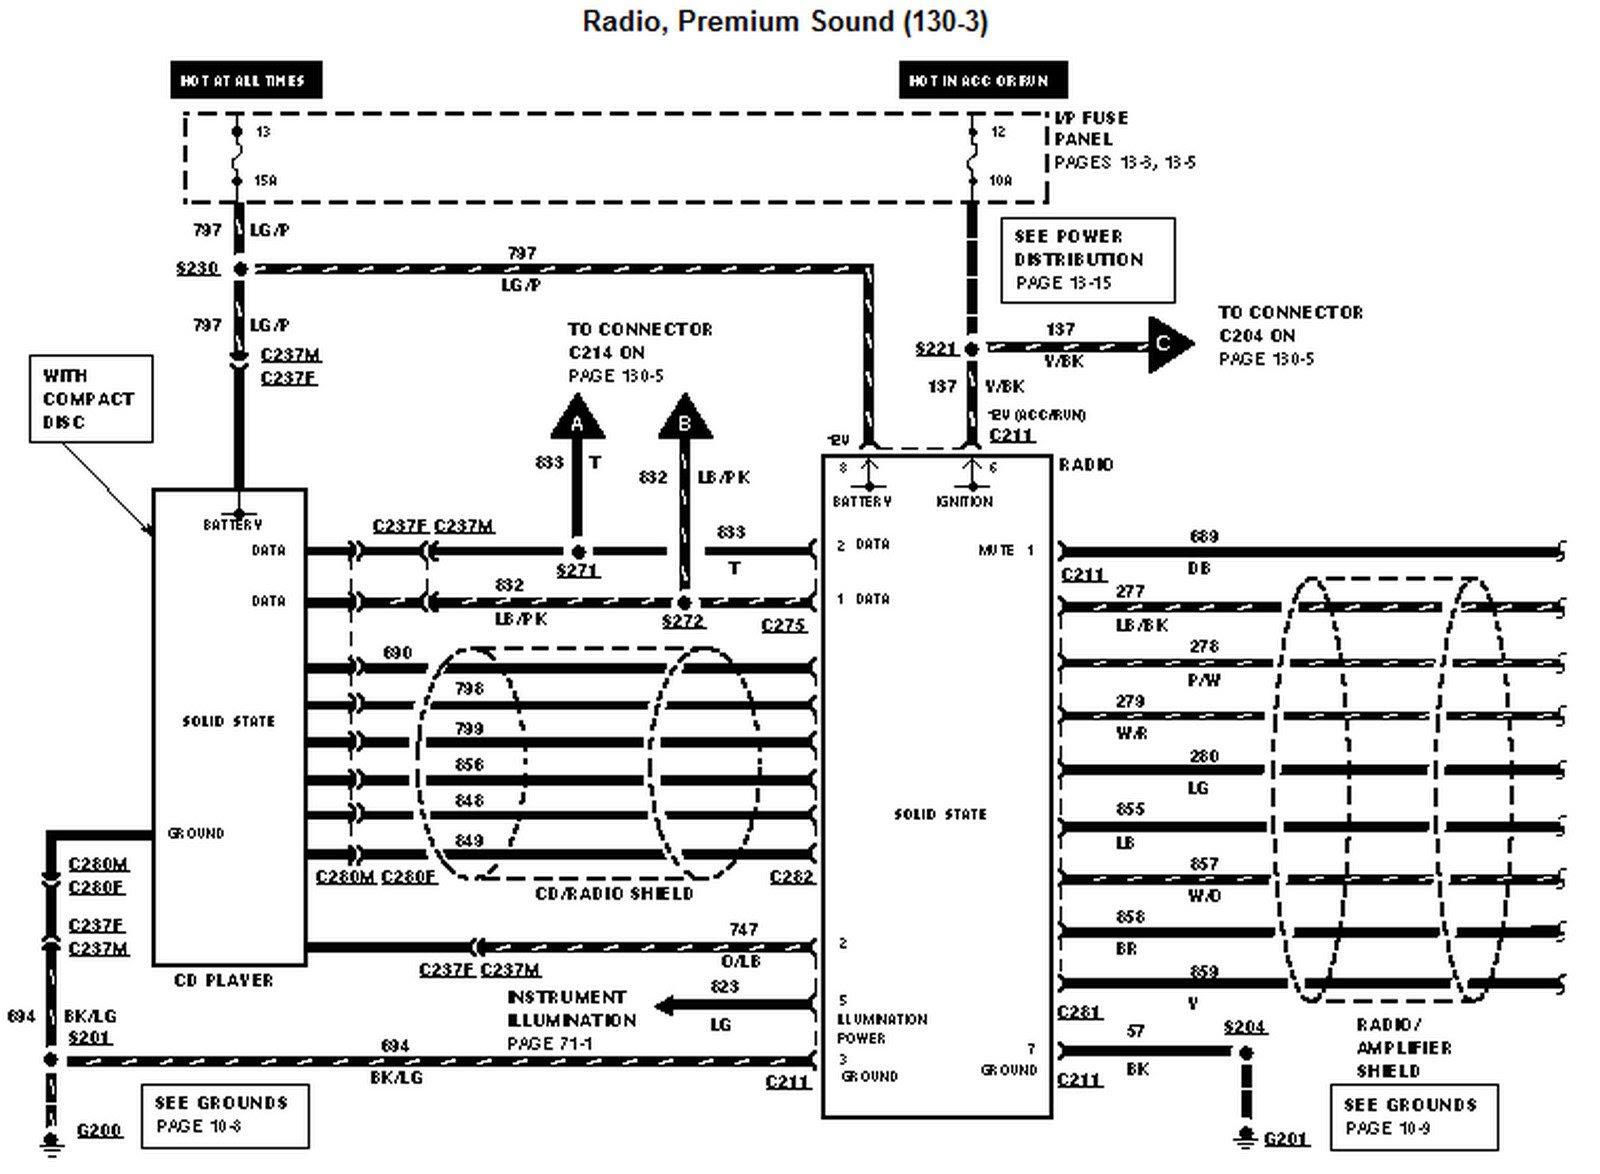 2002 Ford Windstar Radio Wiring Diagram Wiring Diagram Central Central Frankmotors Es